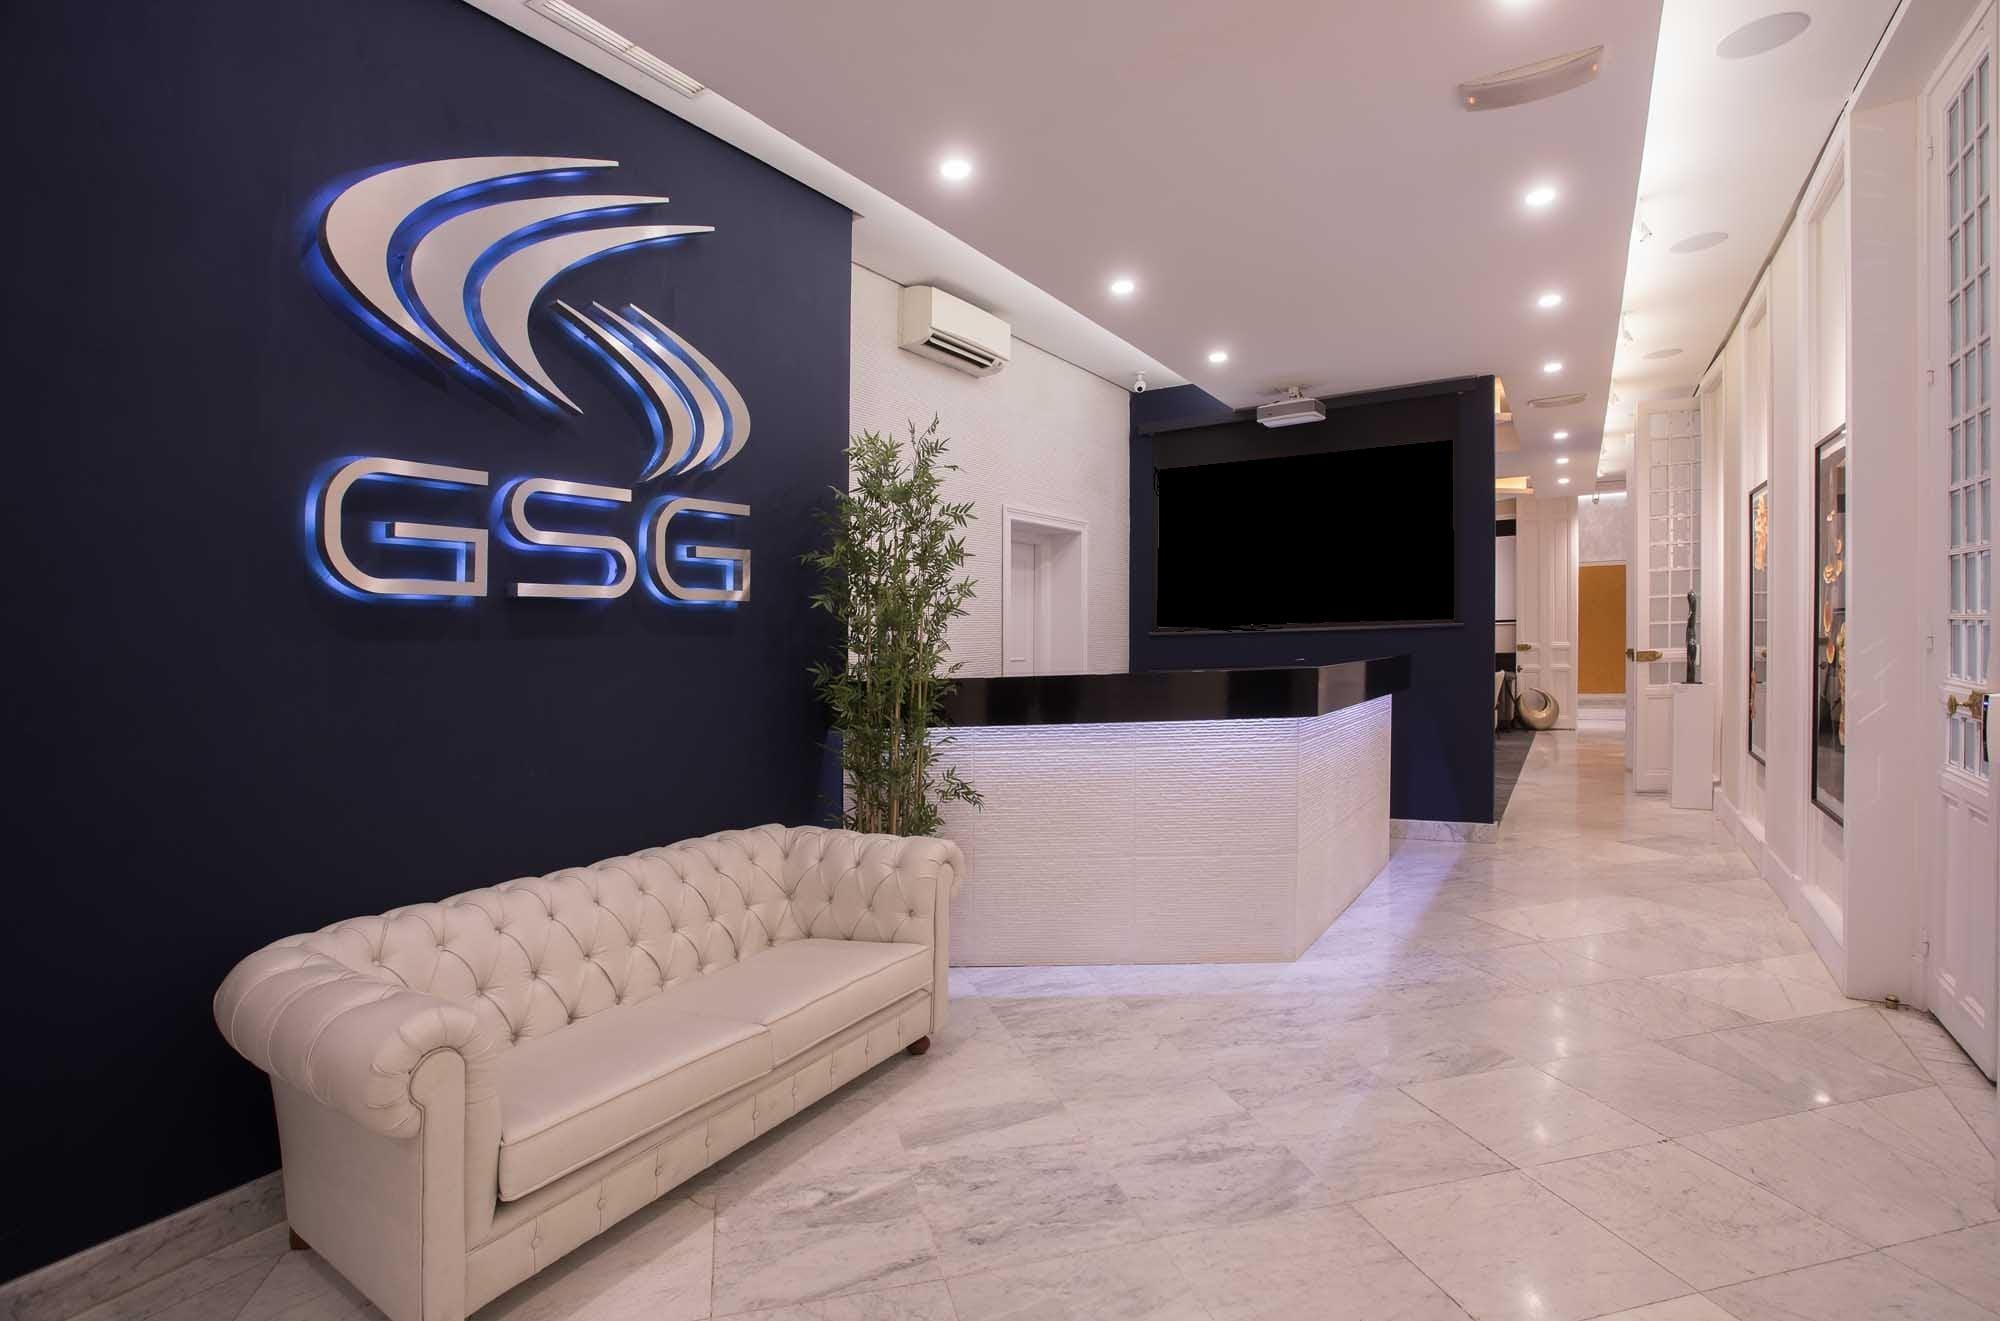 ProWorkSpaces da la bienvenida a dos nuevos centros de GSG BUSINESS HUB